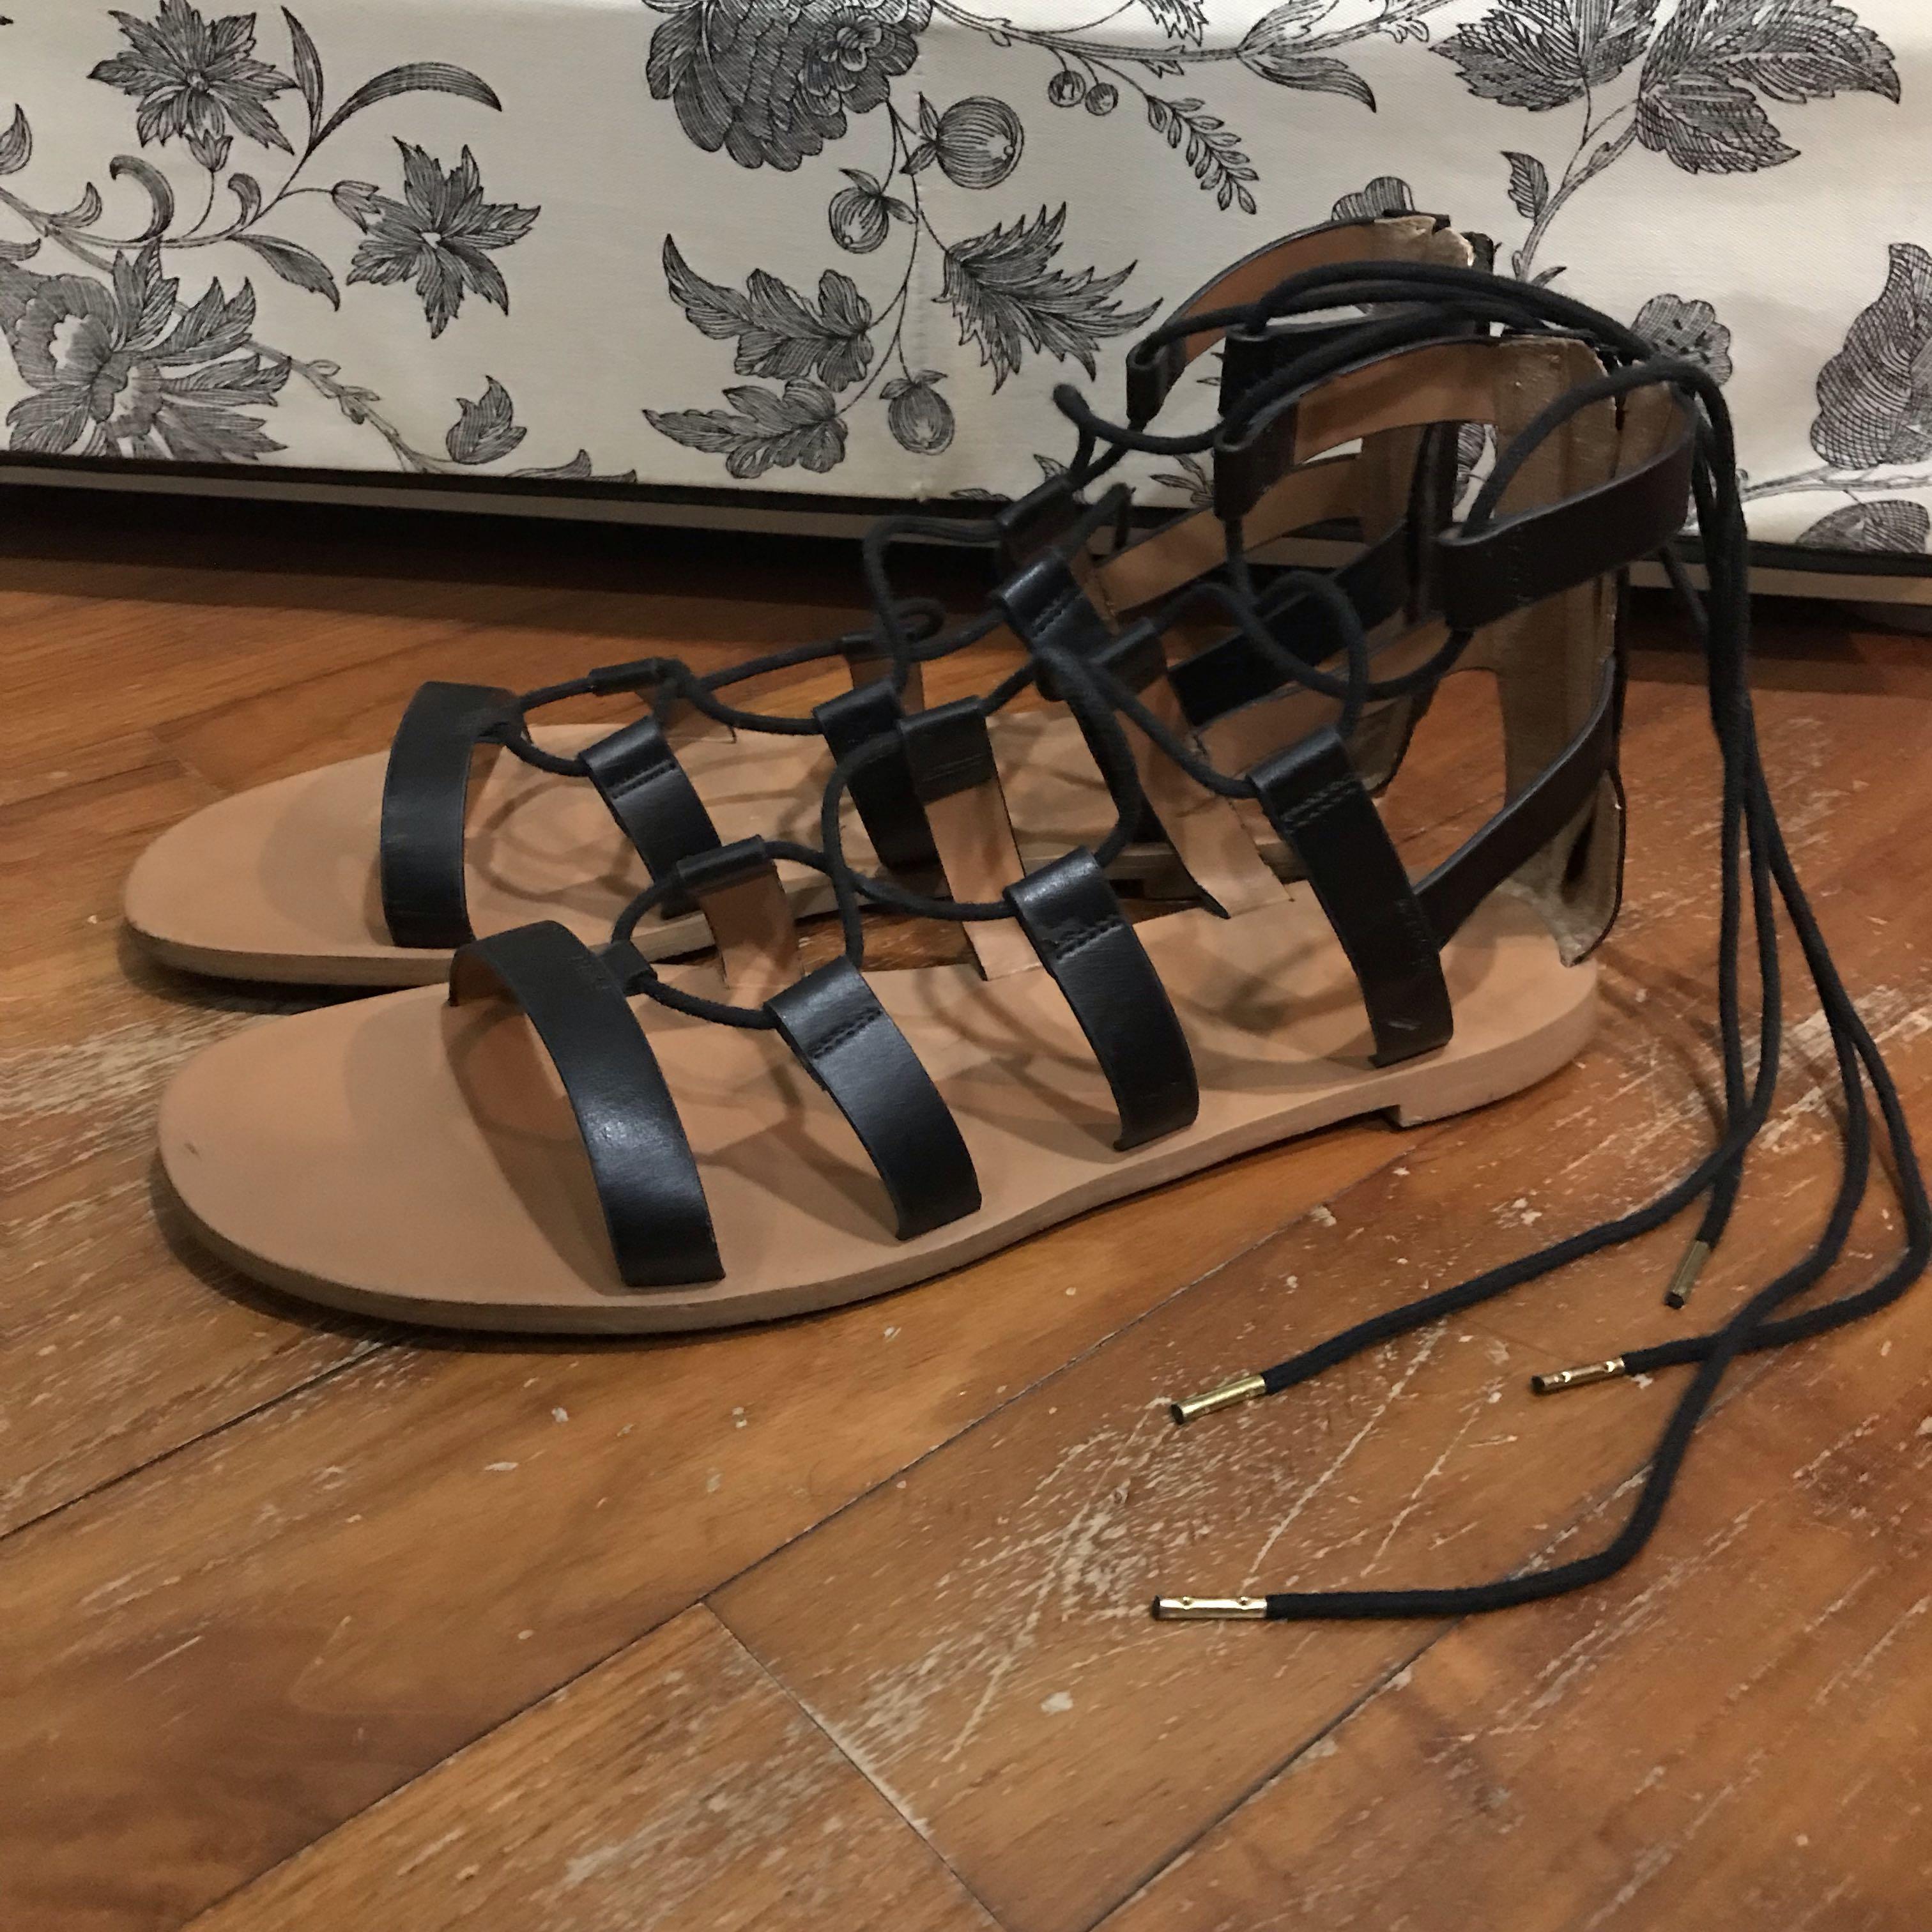 c739e3c3840d H M Gladiator Sandals size 39